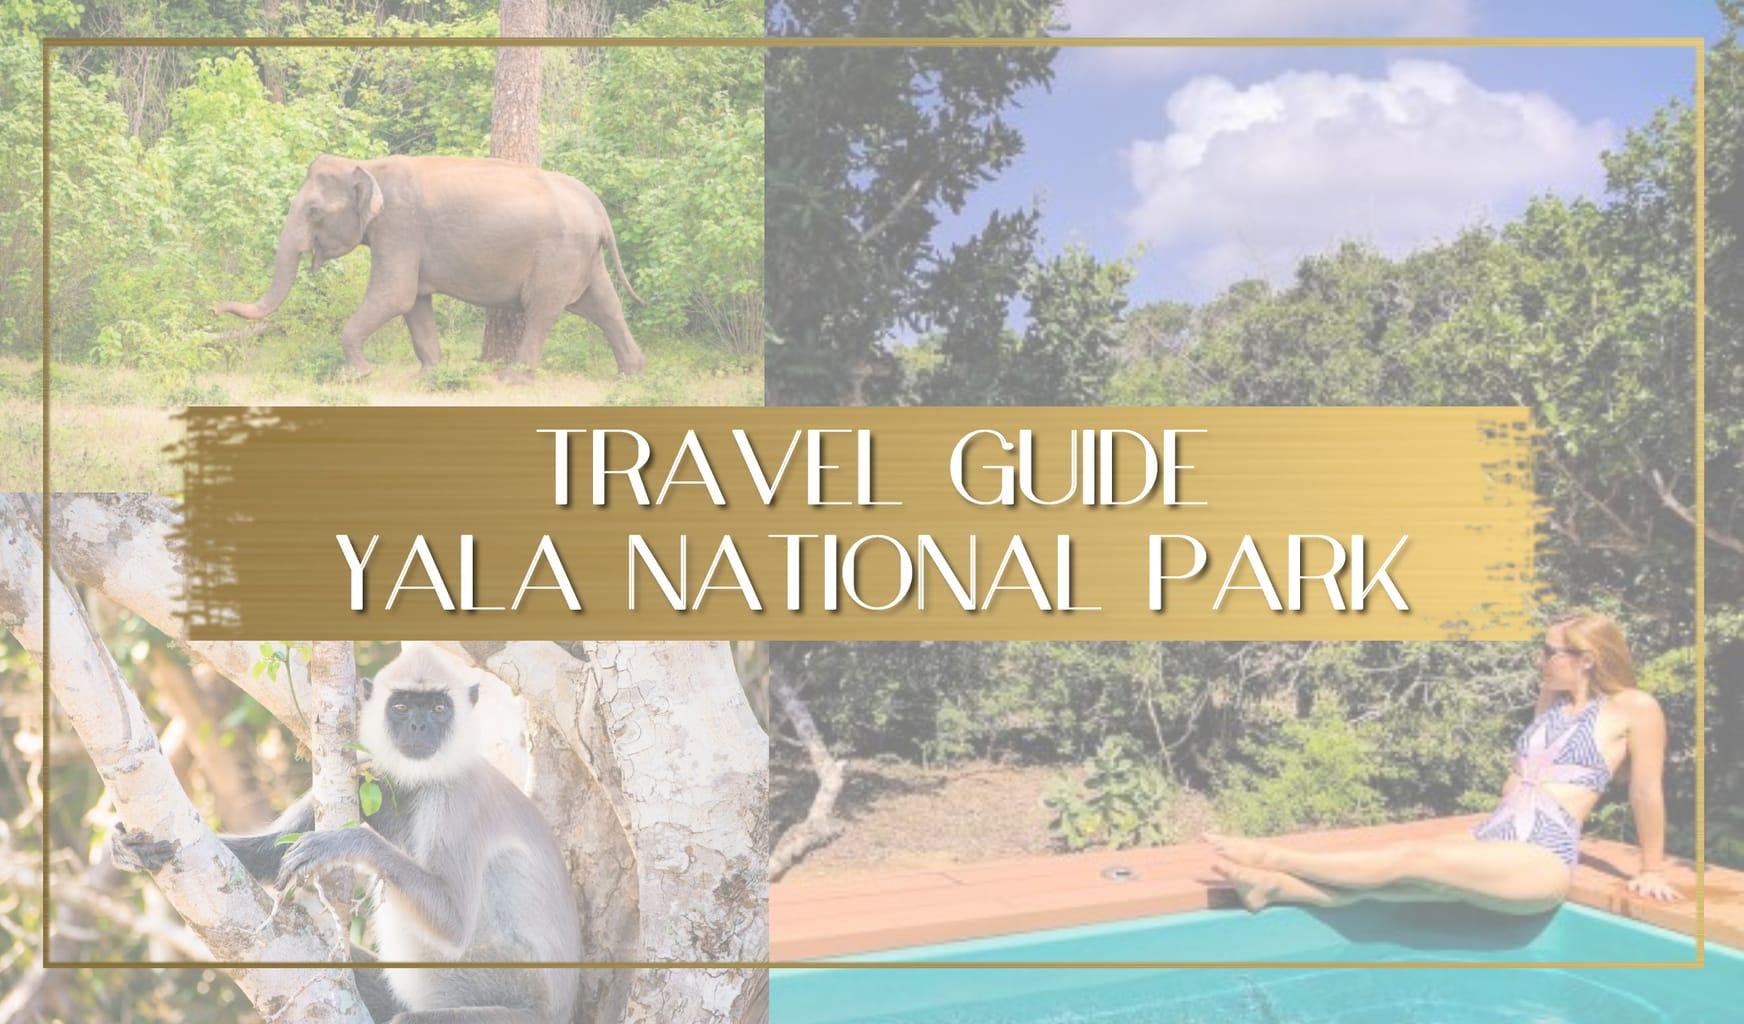 Travel guide to Yala National Park Sri Lanka main